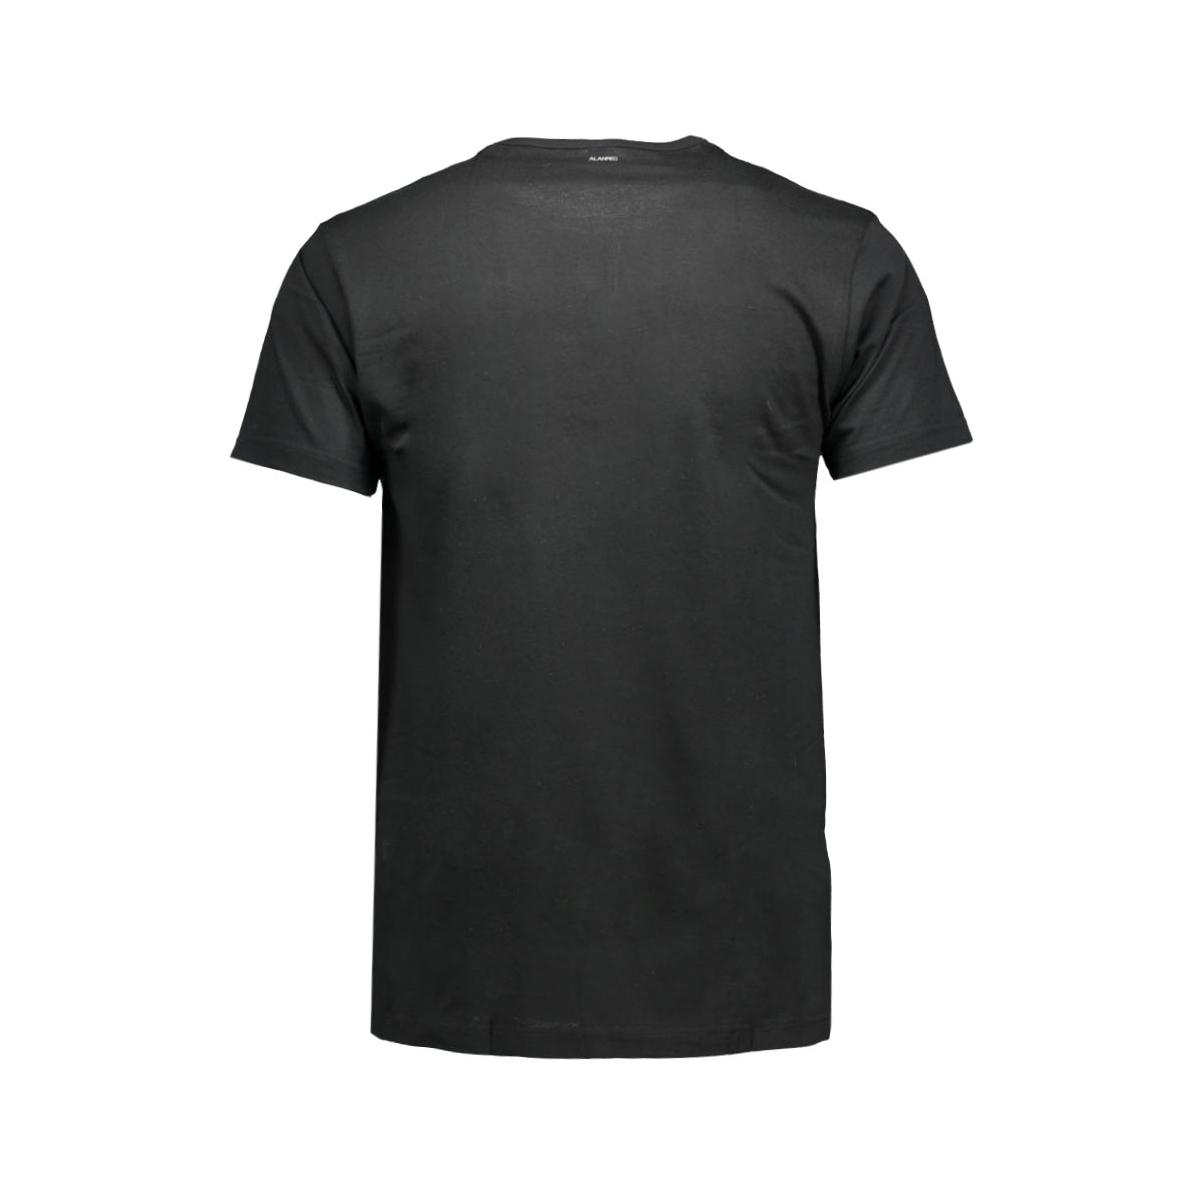 6672 sp derby alan red t-shirt black